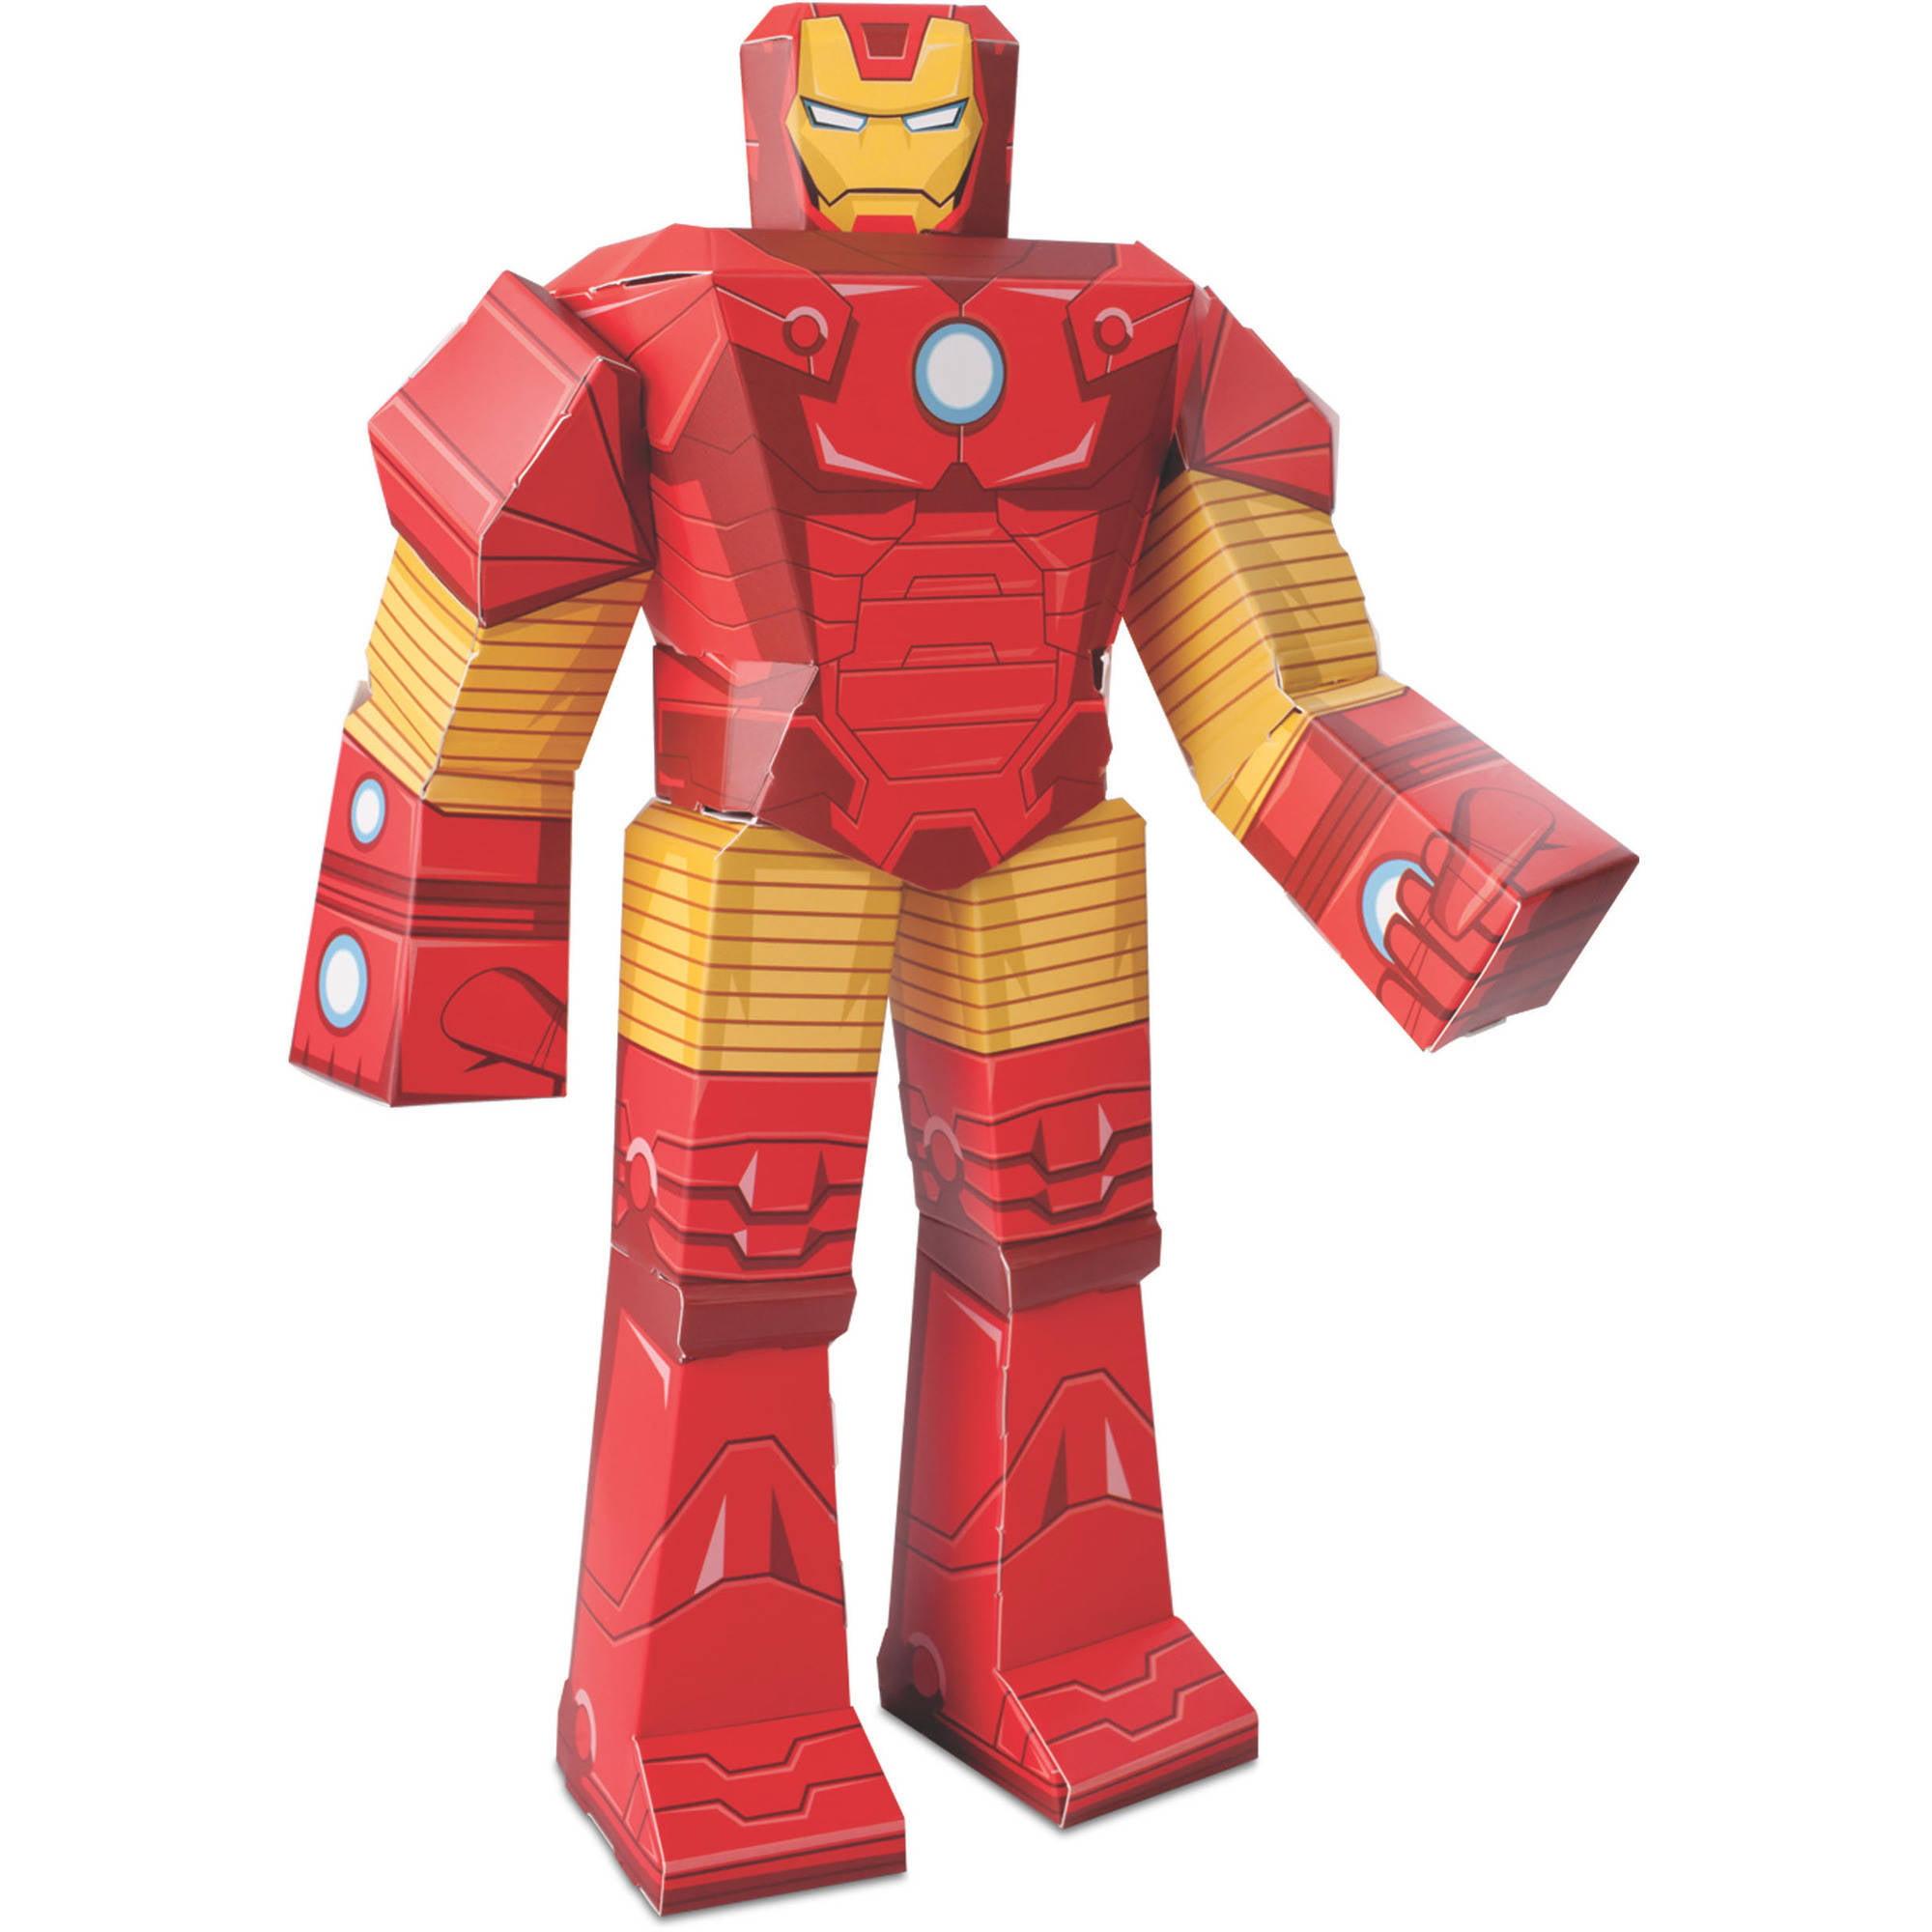 Iron man blueprint papercraft 12 inch figure walmart malvernweather Gallery